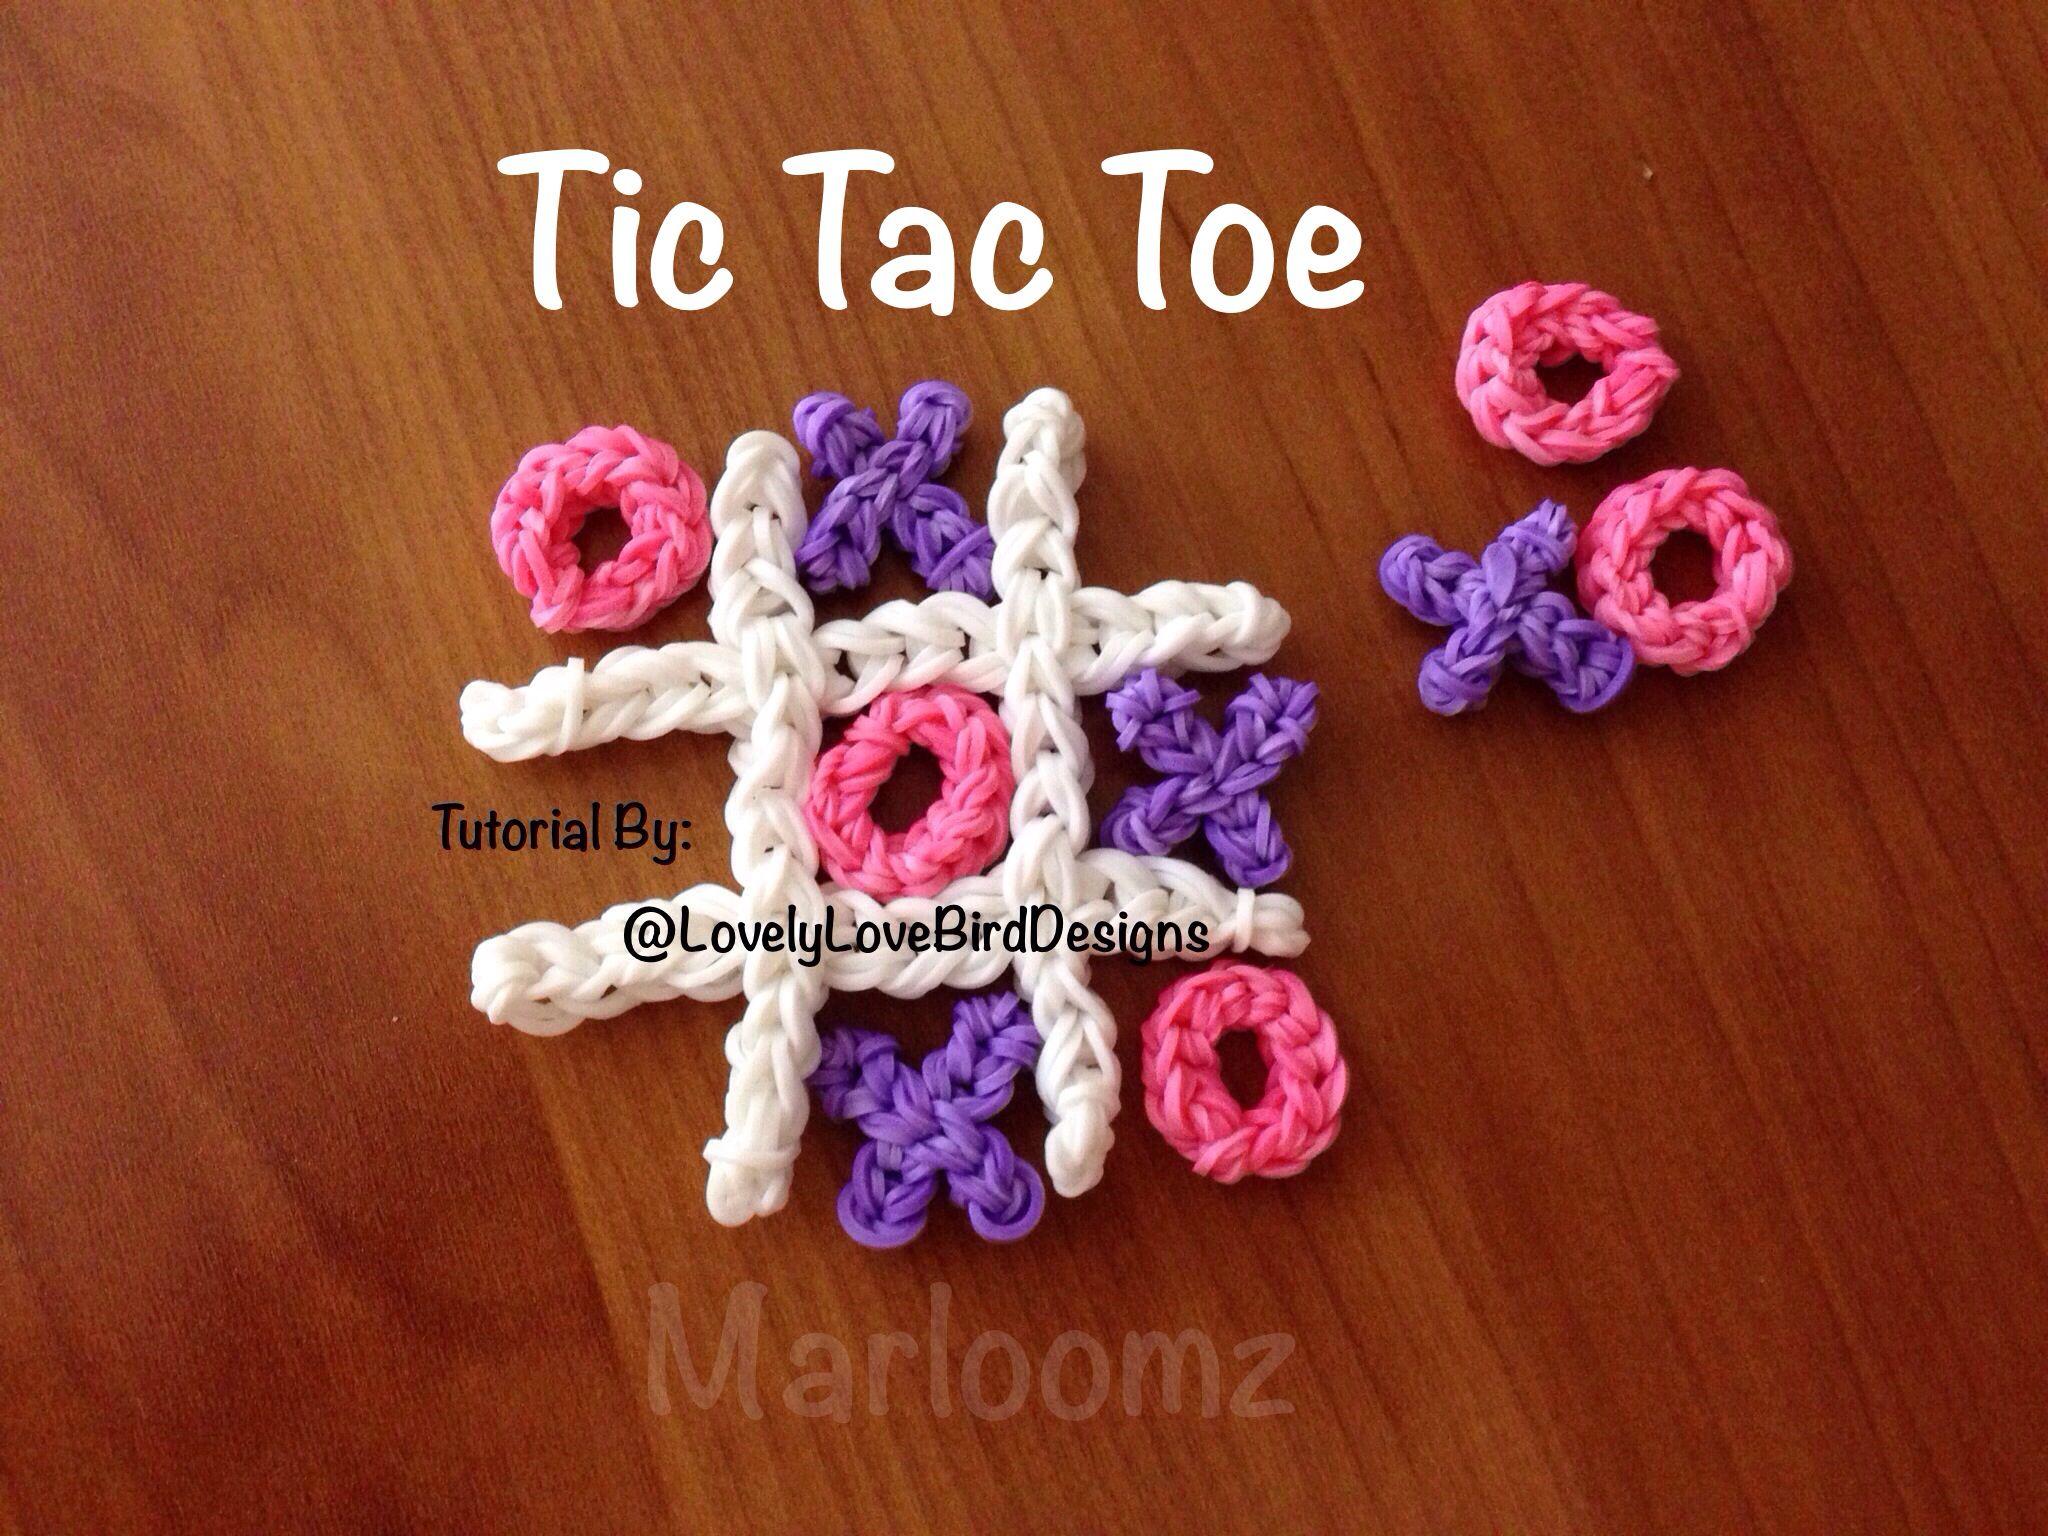 Rainbow Loom Tic Tac Toe Tutorial By: Lovely Lovebird Designs